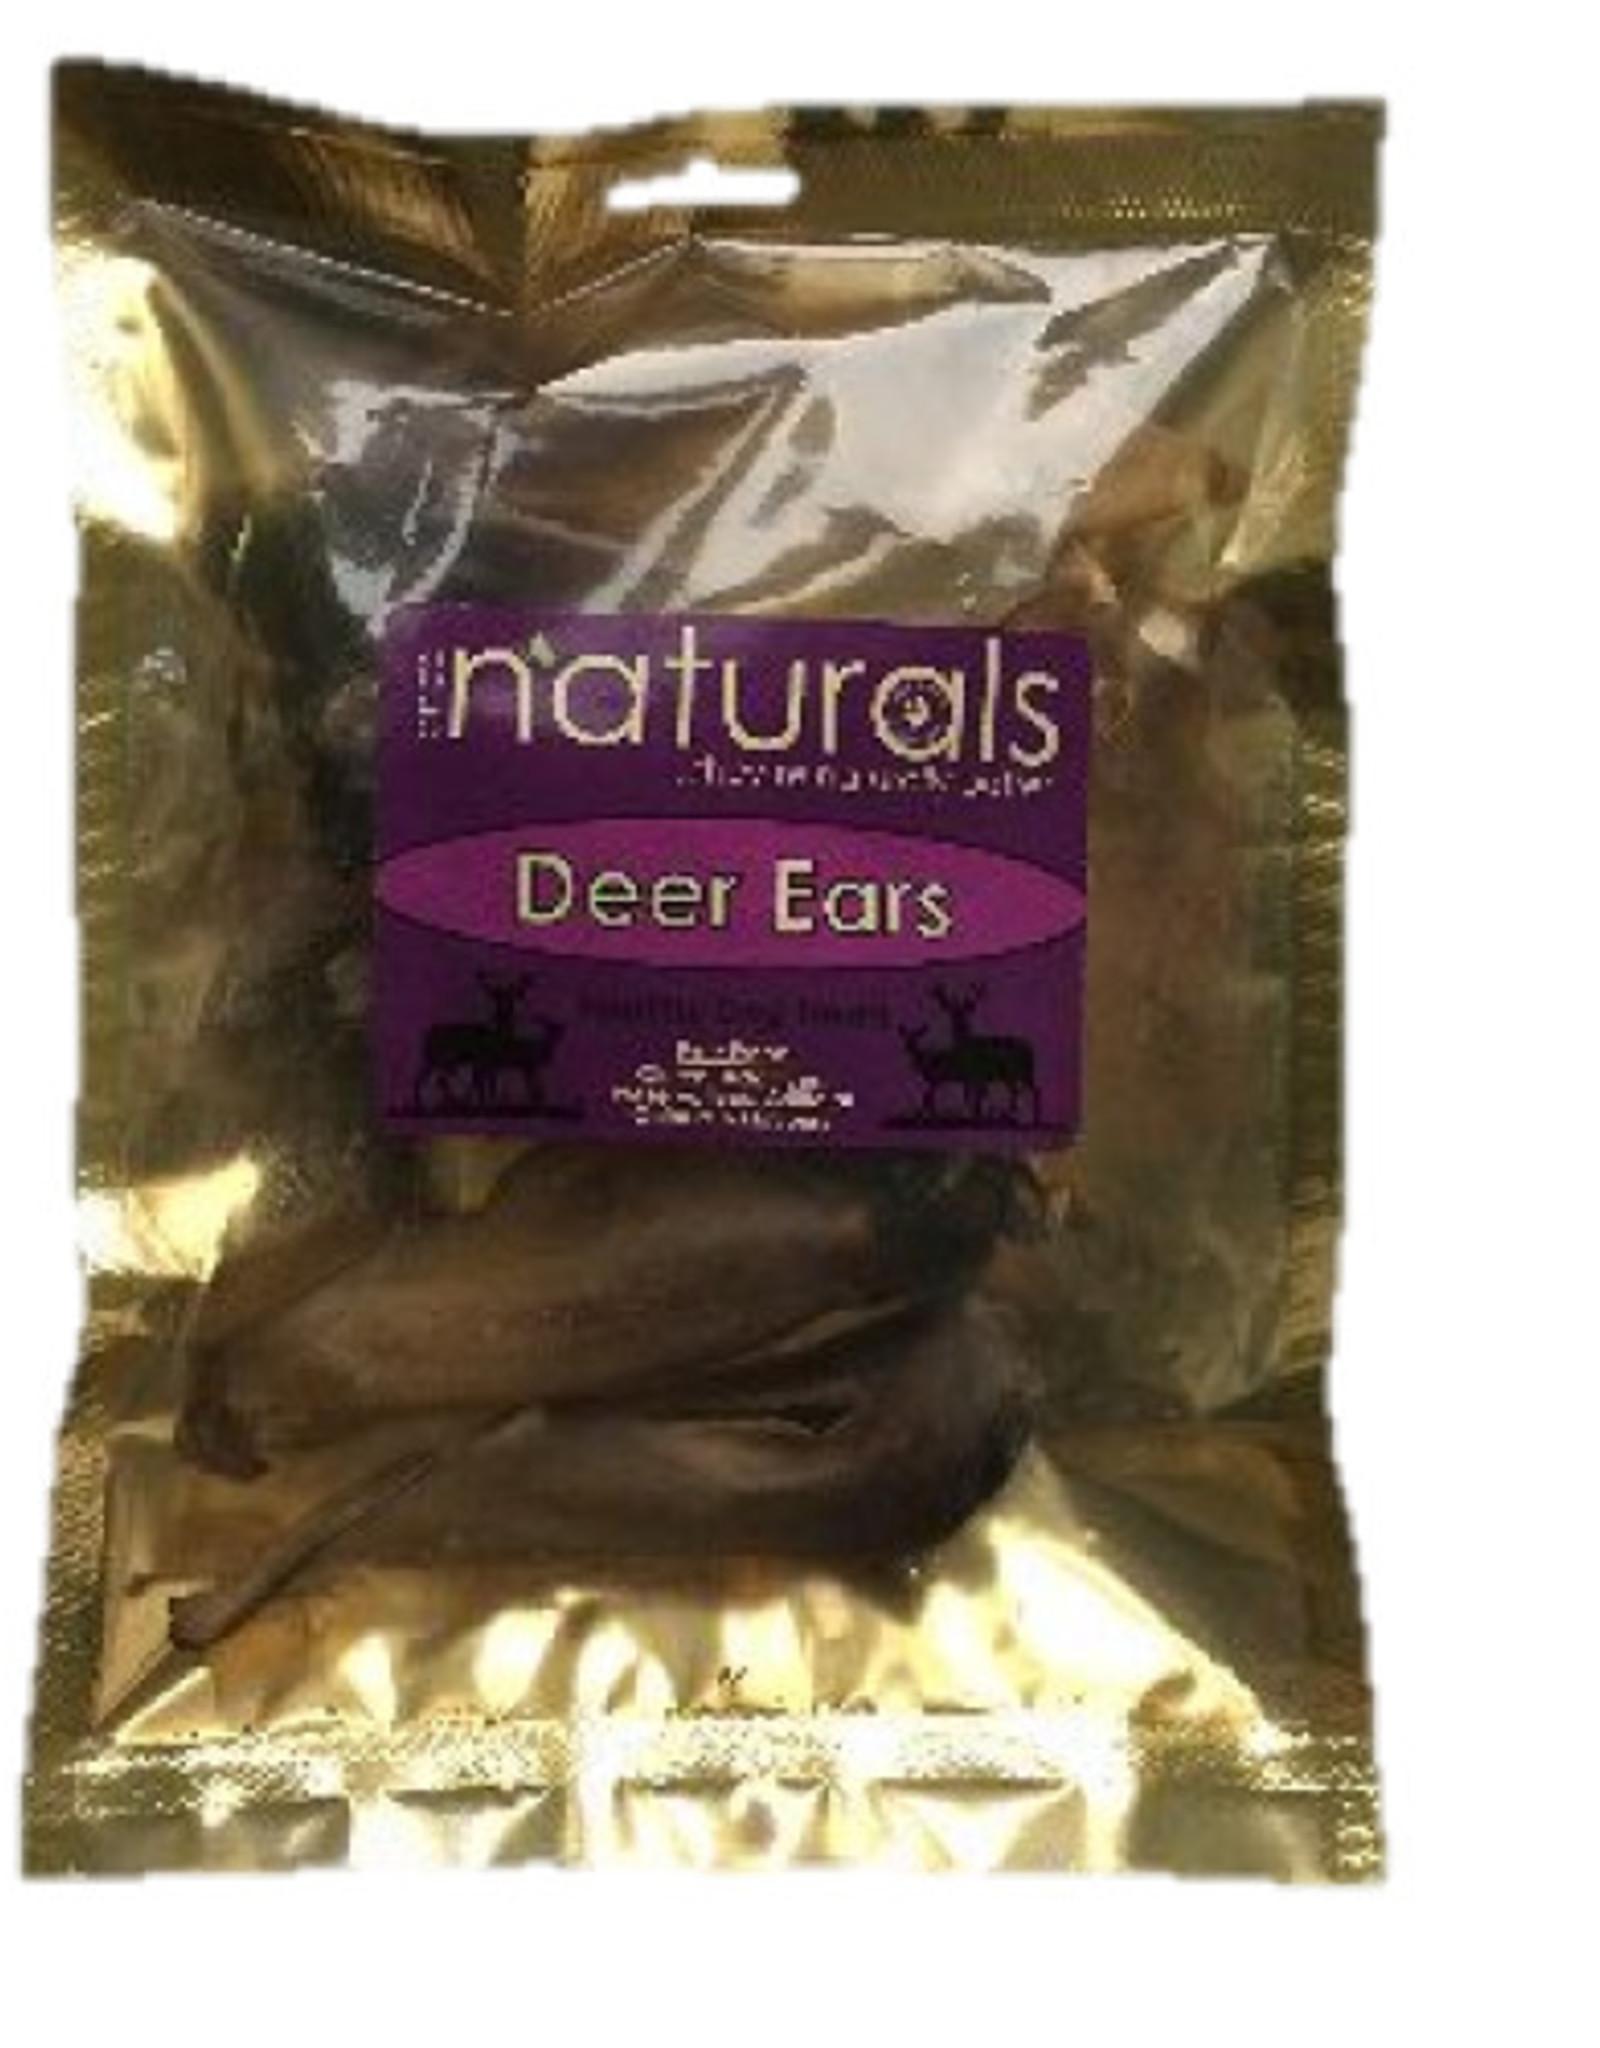 Anco Naturals Deer Ears Dog Chew Treats, 5 pack